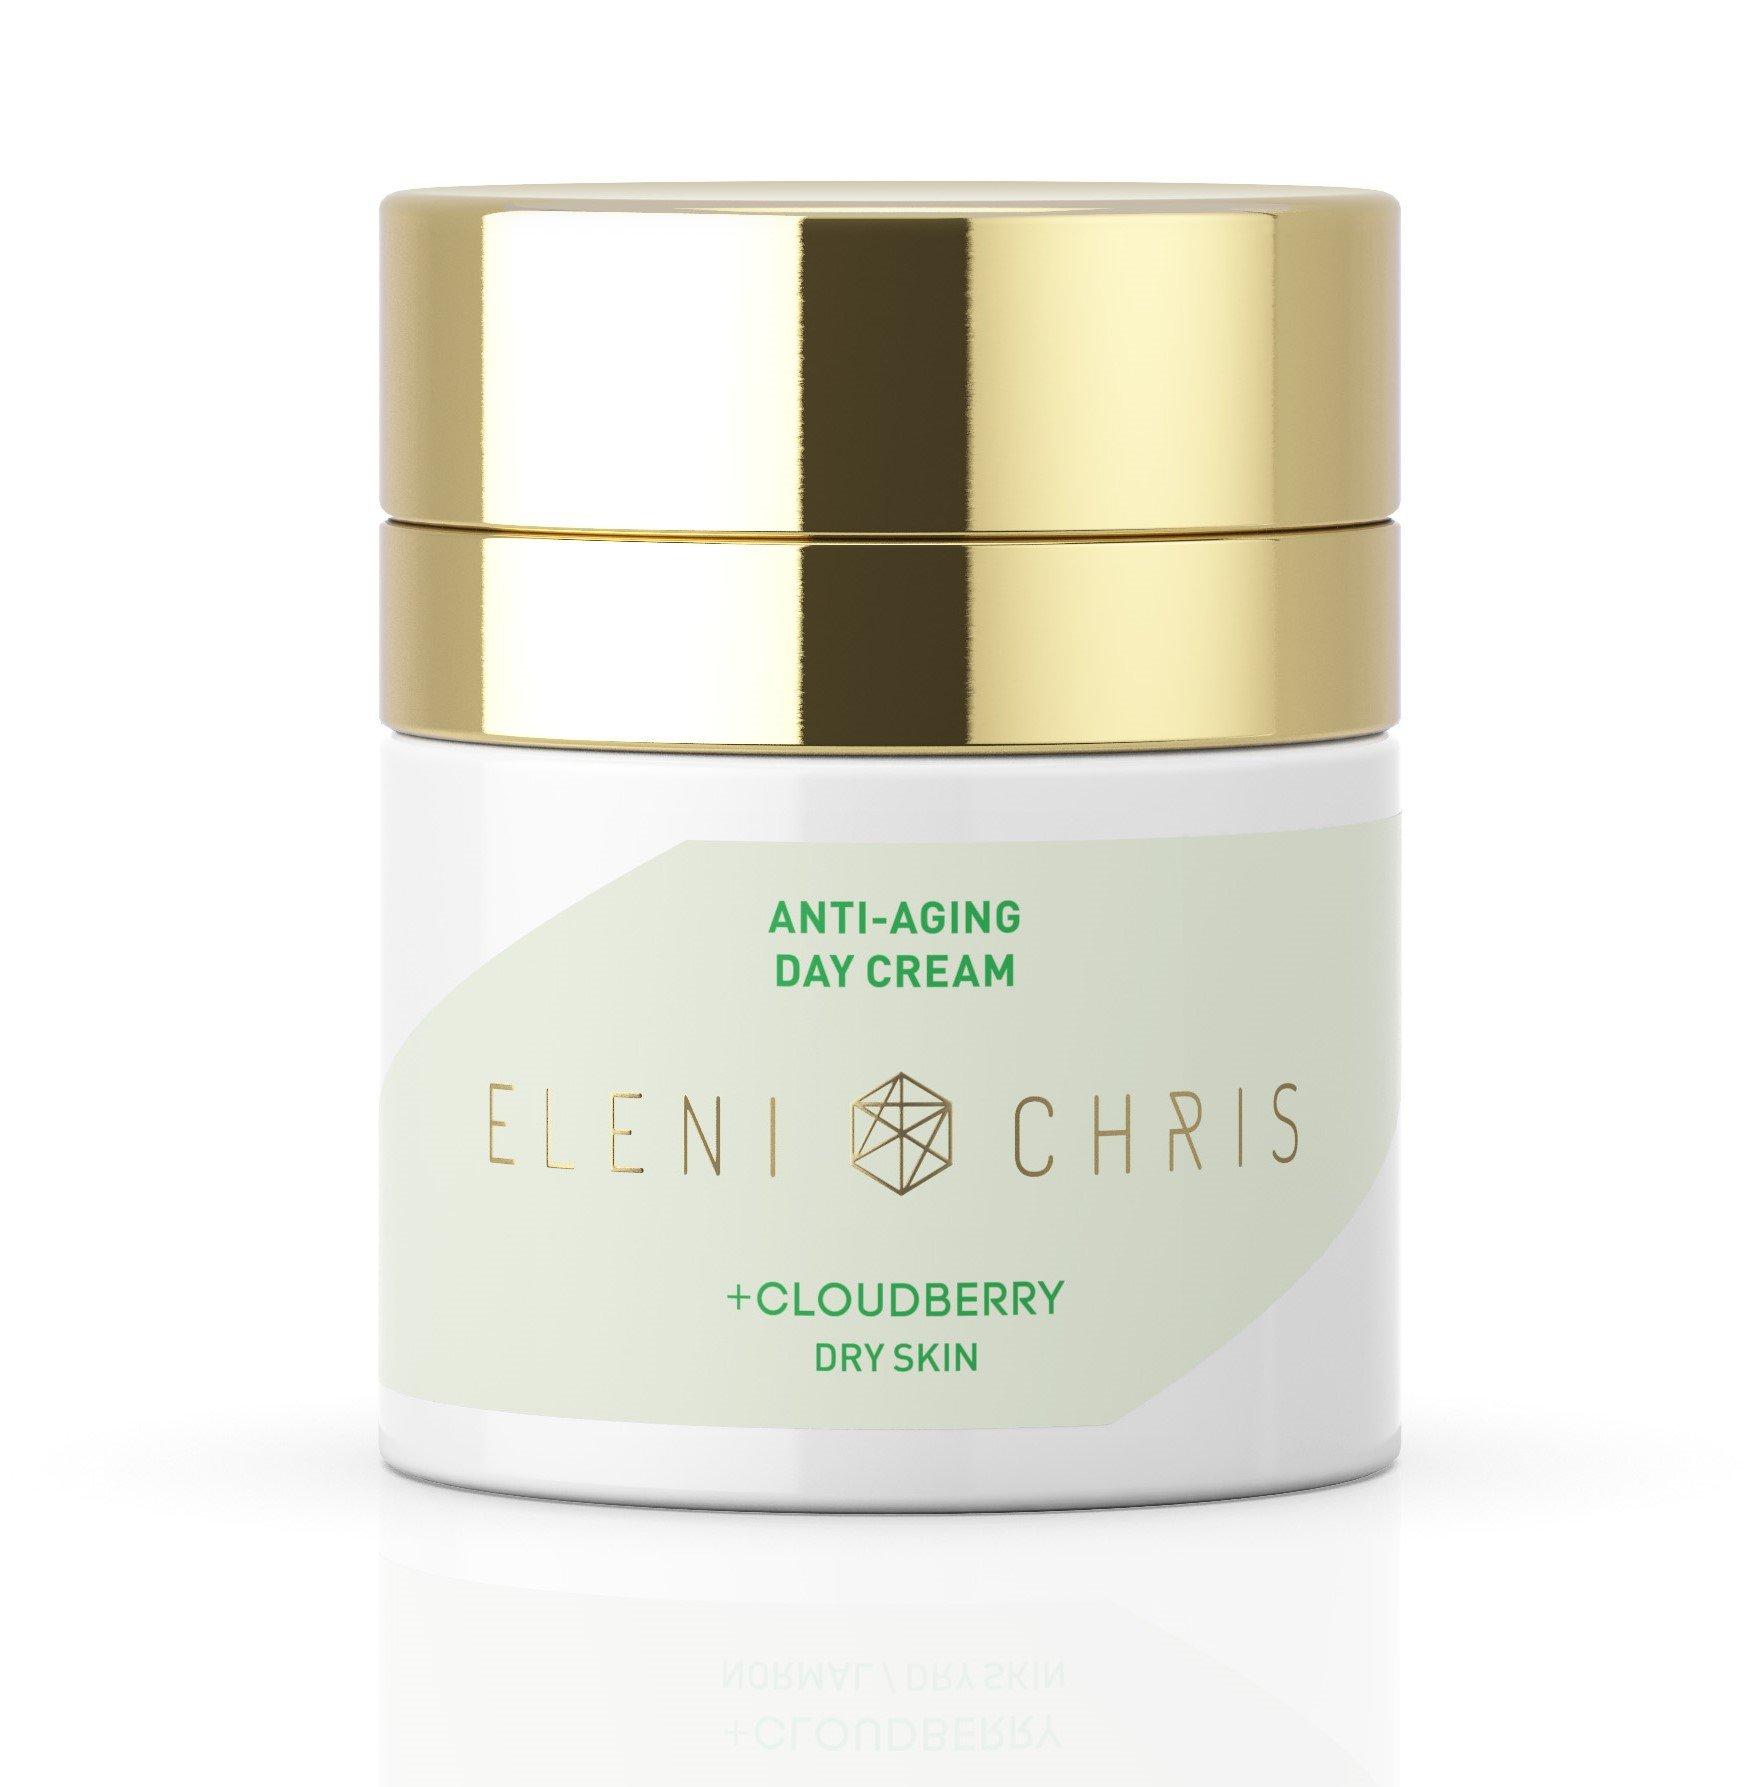 Eleni & Chris - Anti-Aging Day Cream for Normal or Dry Skin, 50ml/1.7 Oz. (Dry Skin)